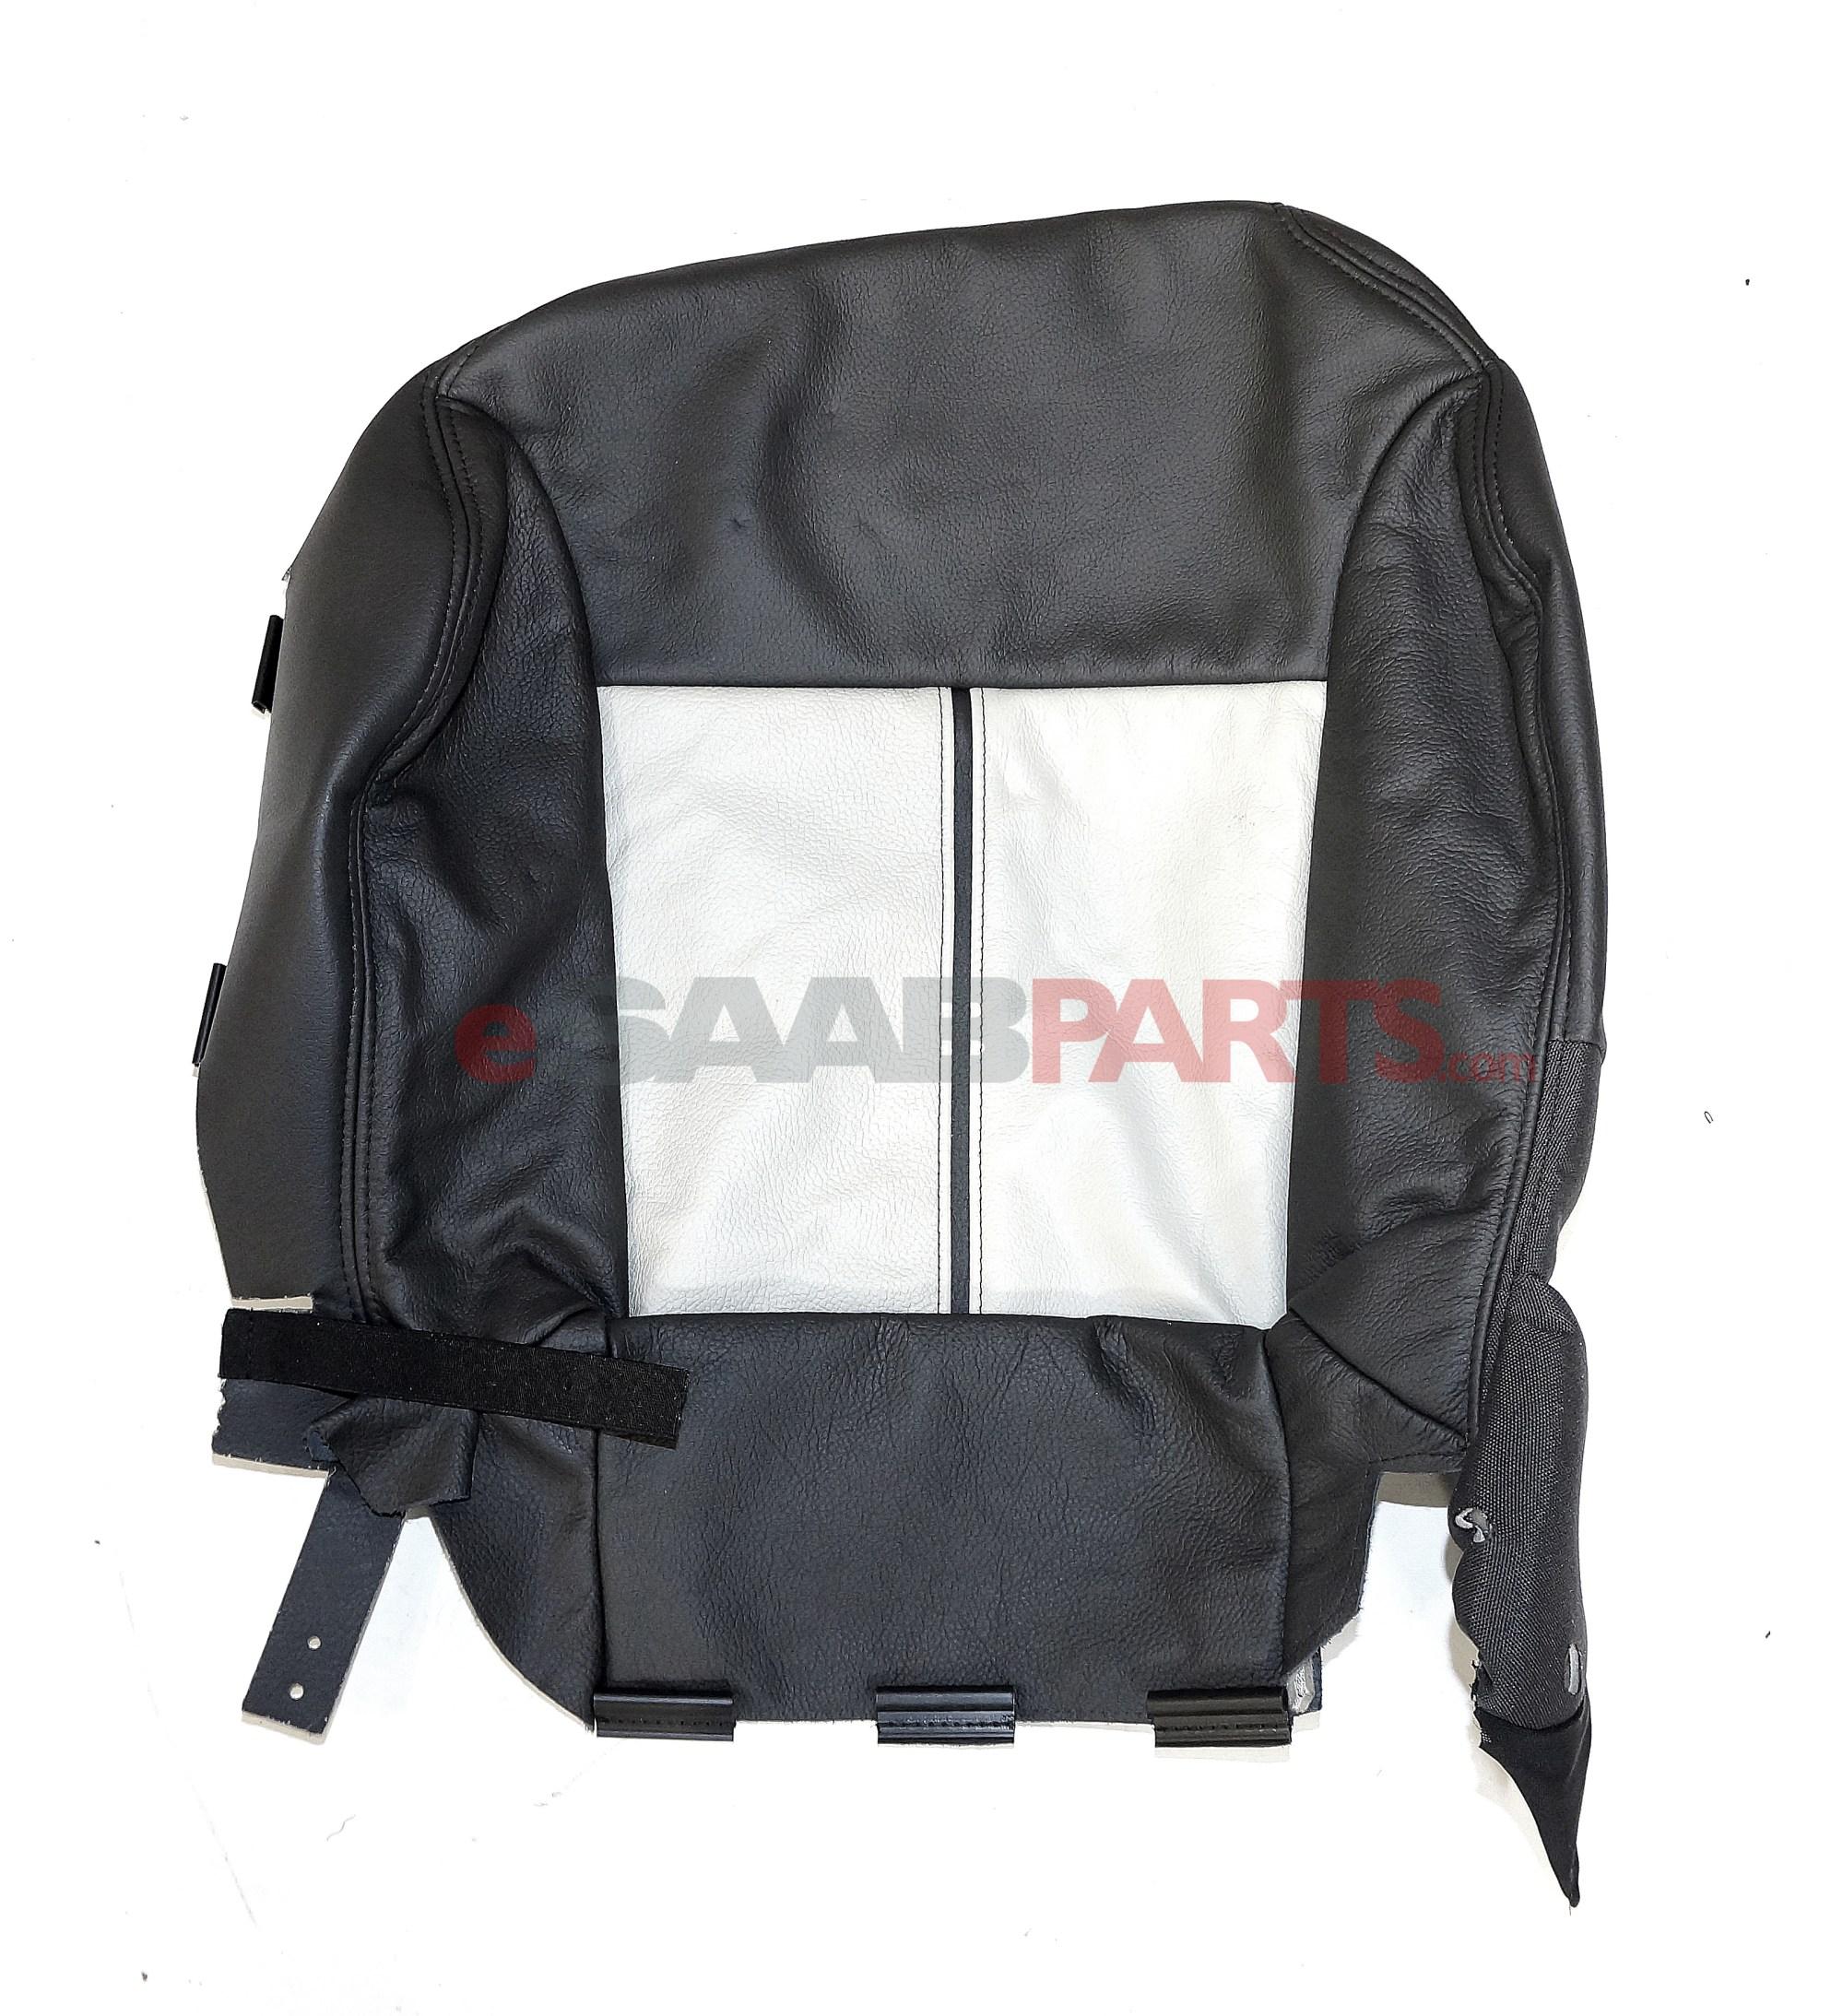 hight resolution of new saab 9 3 seat cover lh bottom black beige b06 aero convertible oem 12770891 ebay